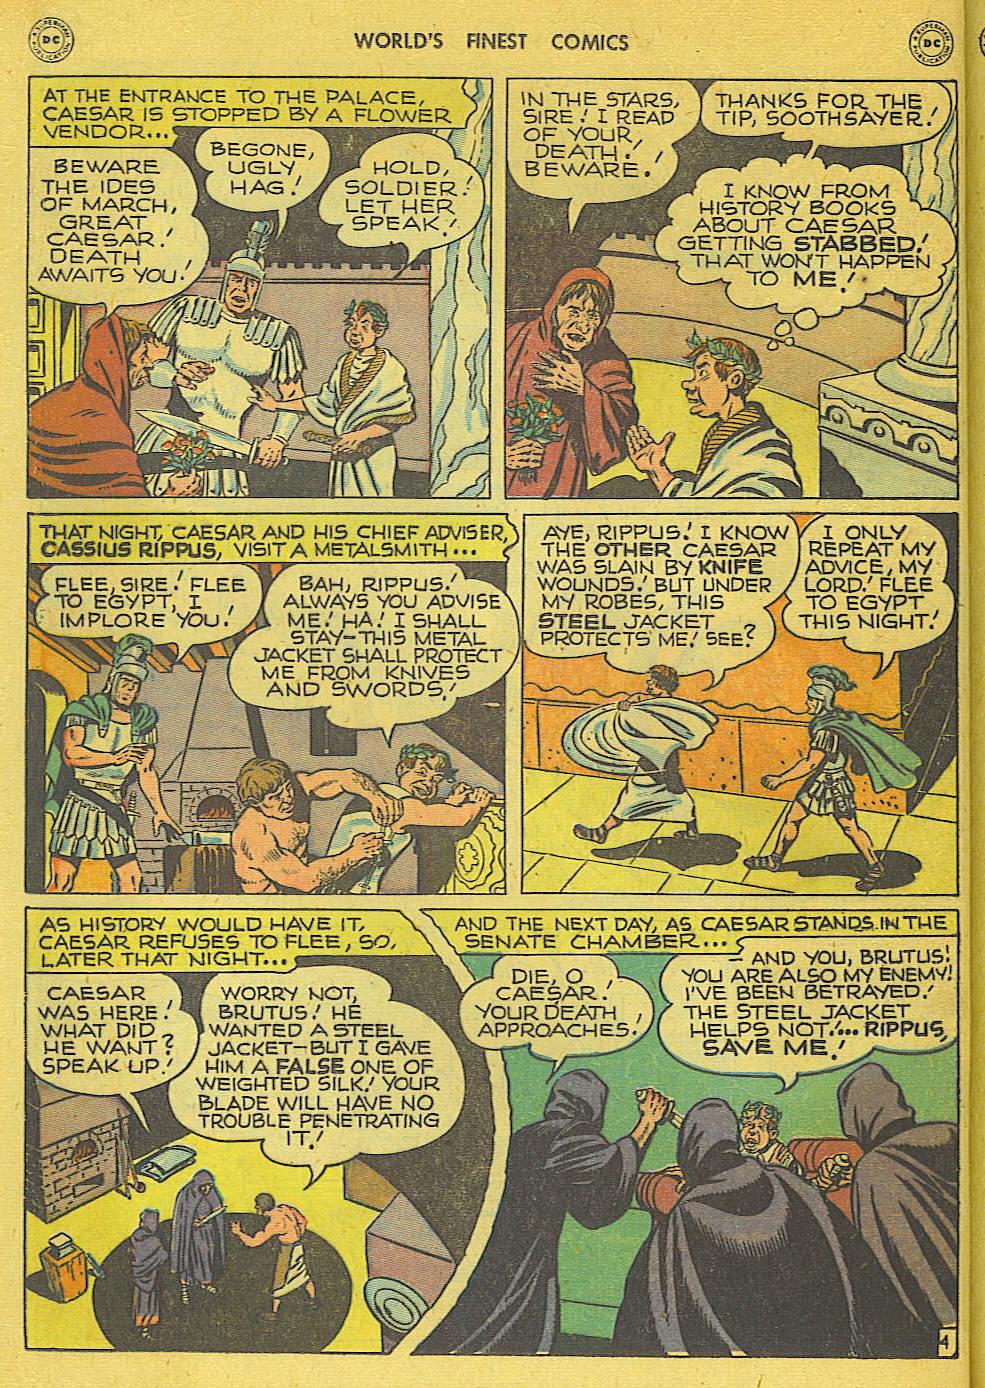 Read online World's Finest Comics comic -  Issue #34 - 30